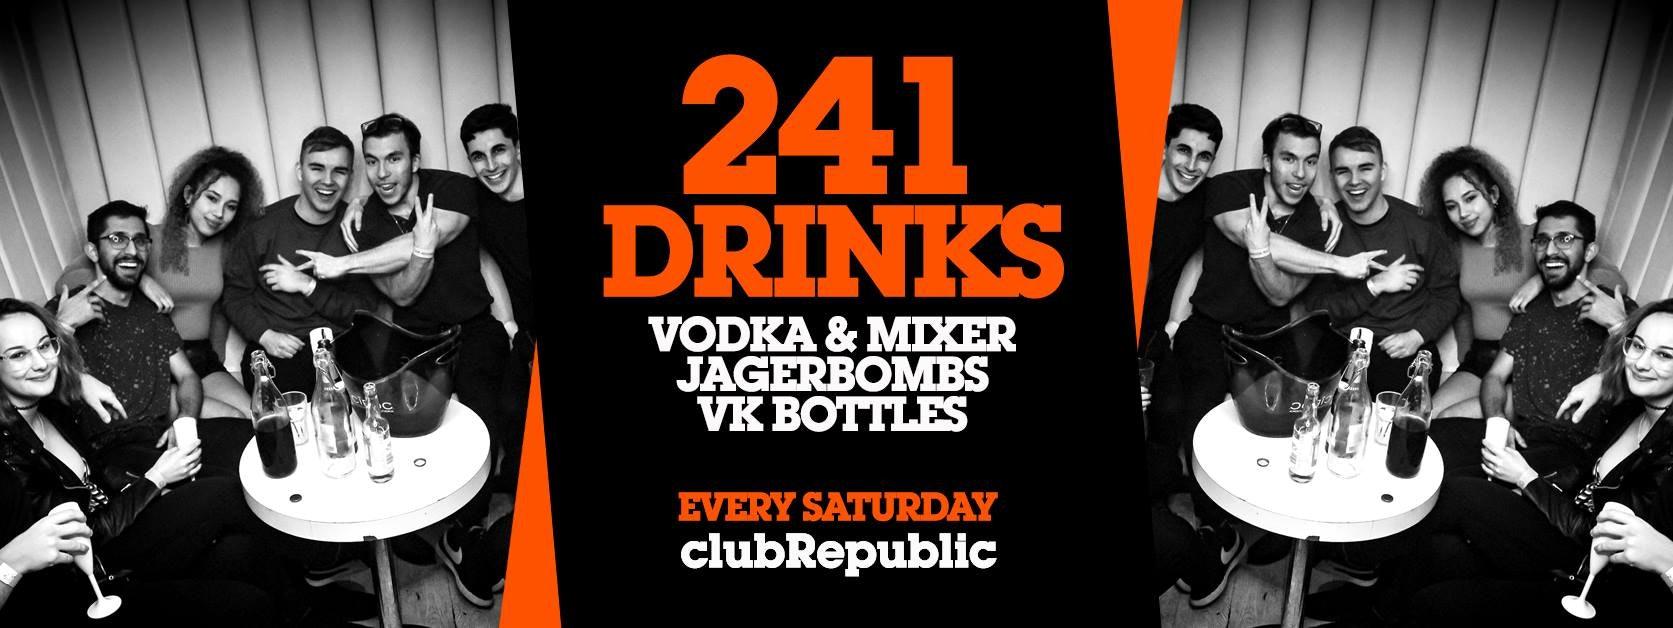 Republic Saturdays // 241 Vodka, Jagerbombs & VK // 3 Rooms, 3 DJ's, 3 Music Genres